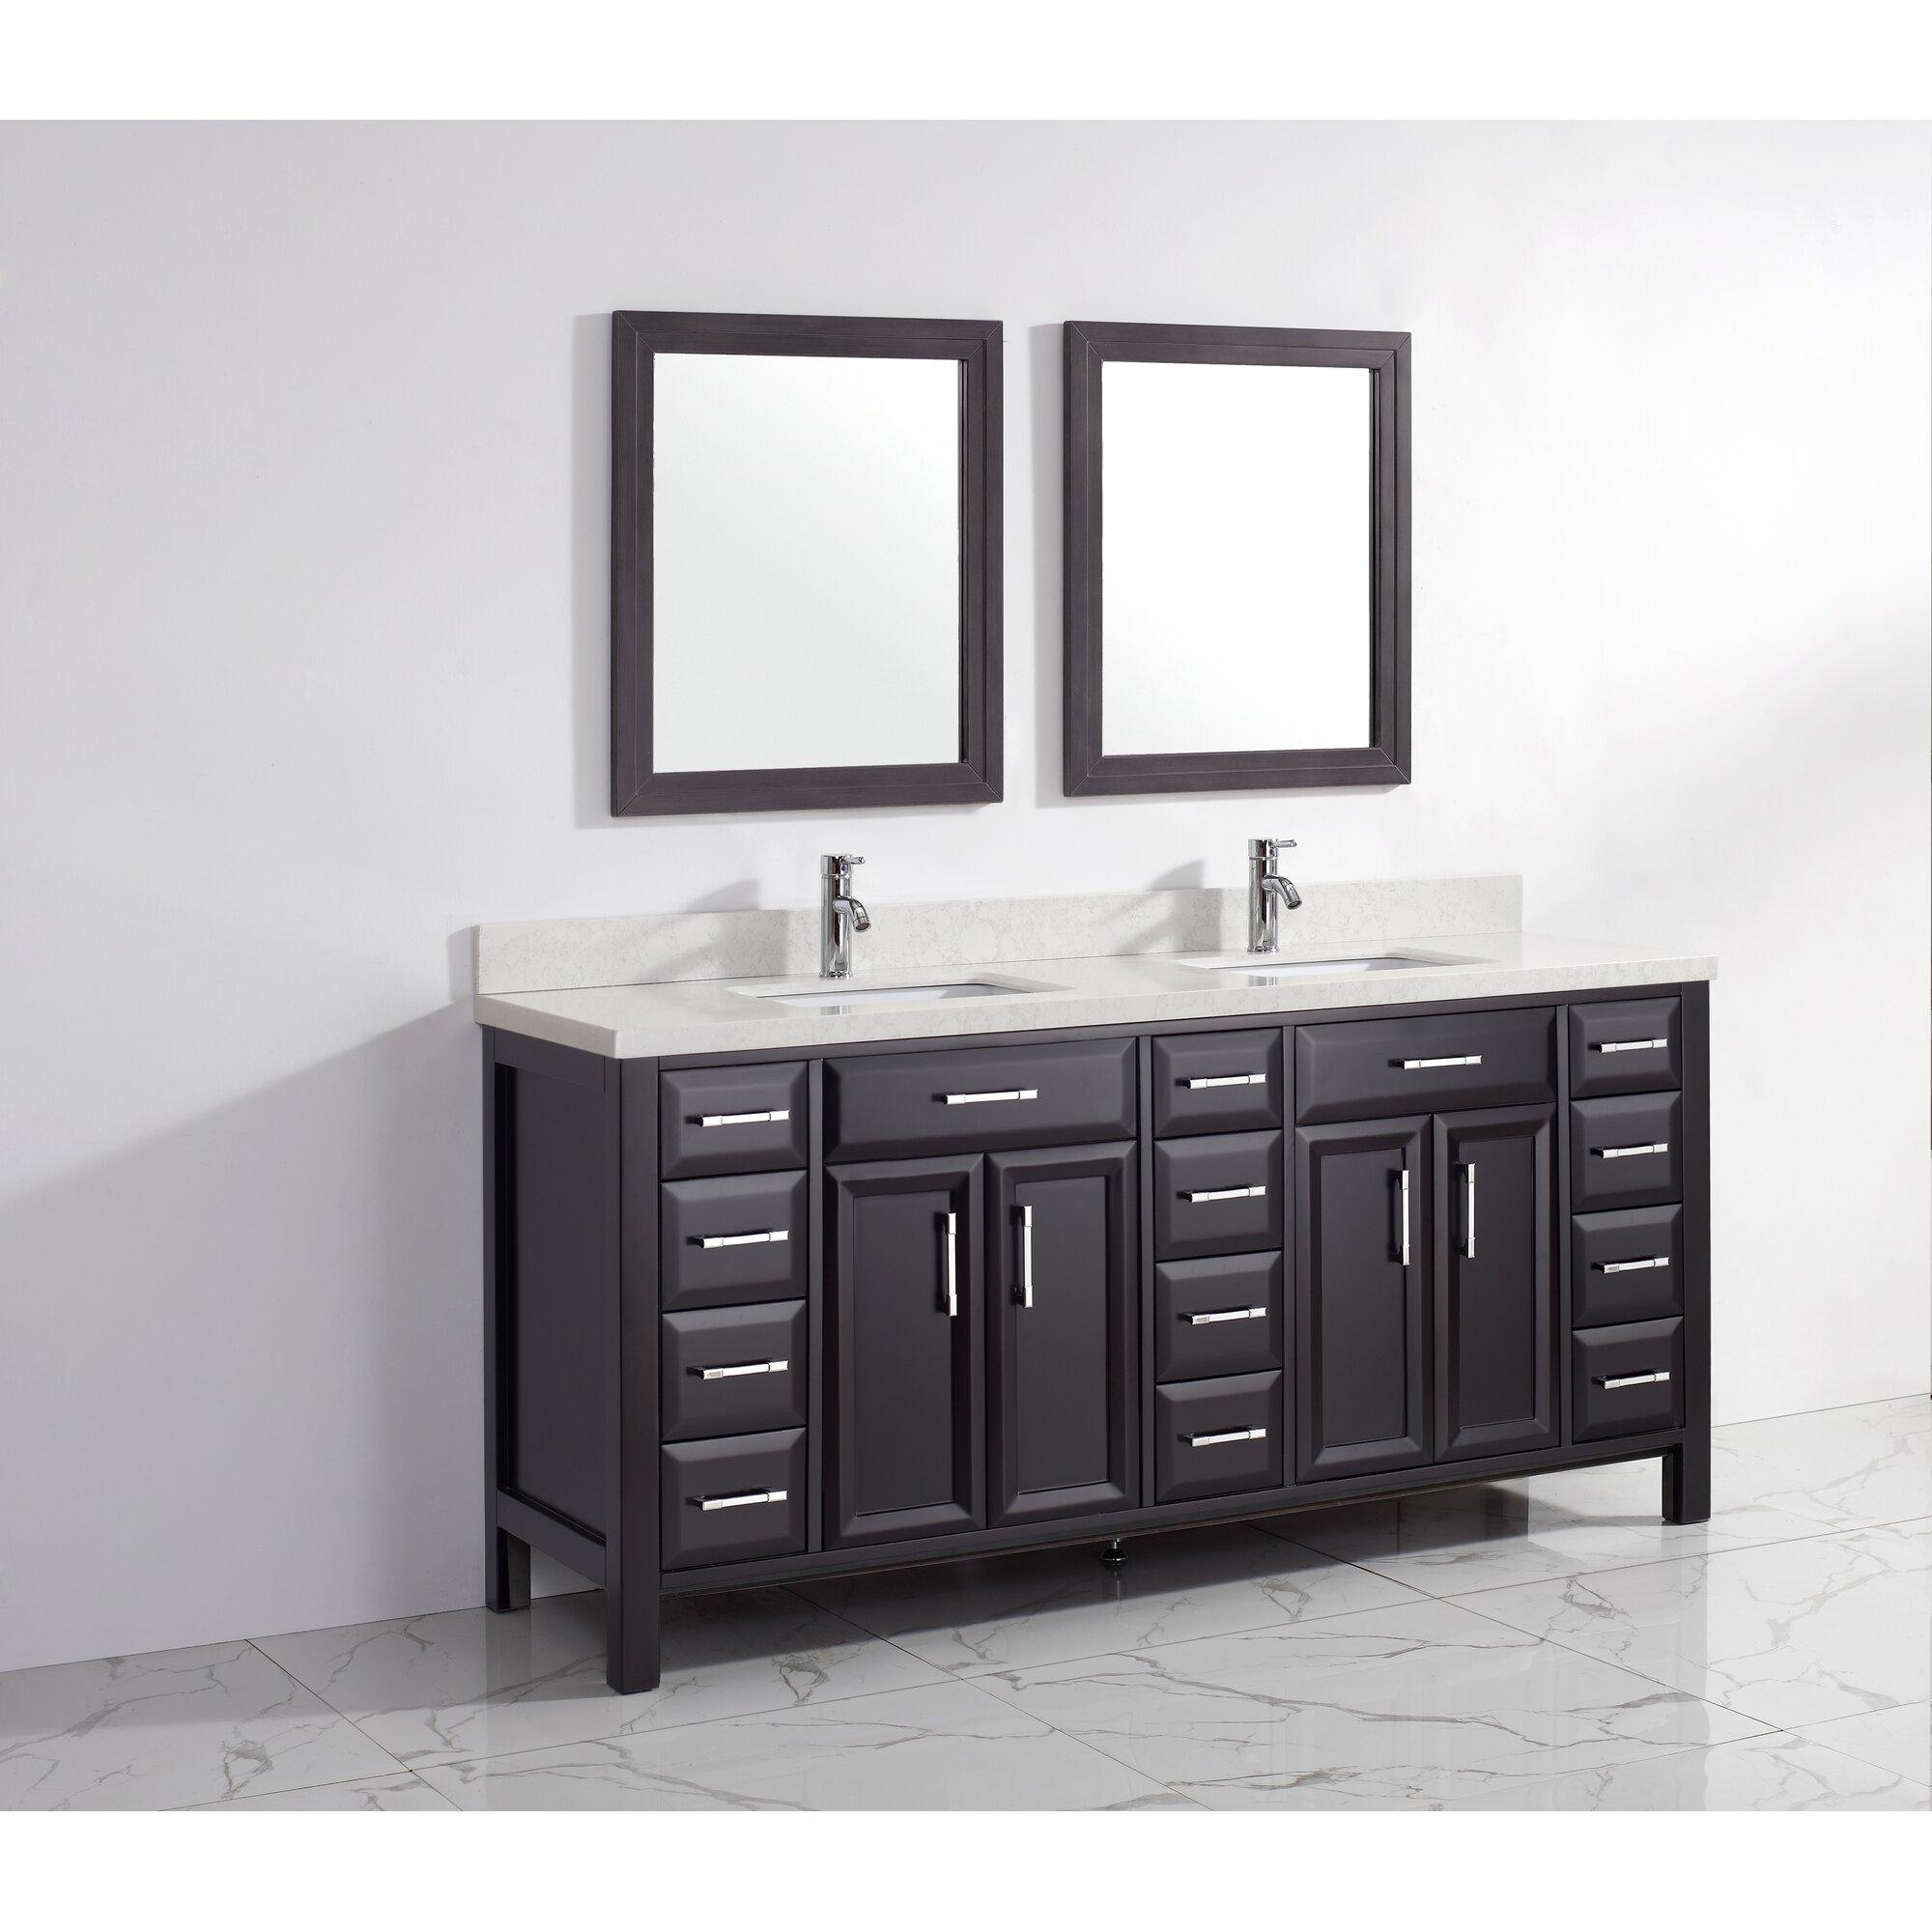 Bauhaus Bath Caledonia 75 Double Bathroom Vanity Set Reviews